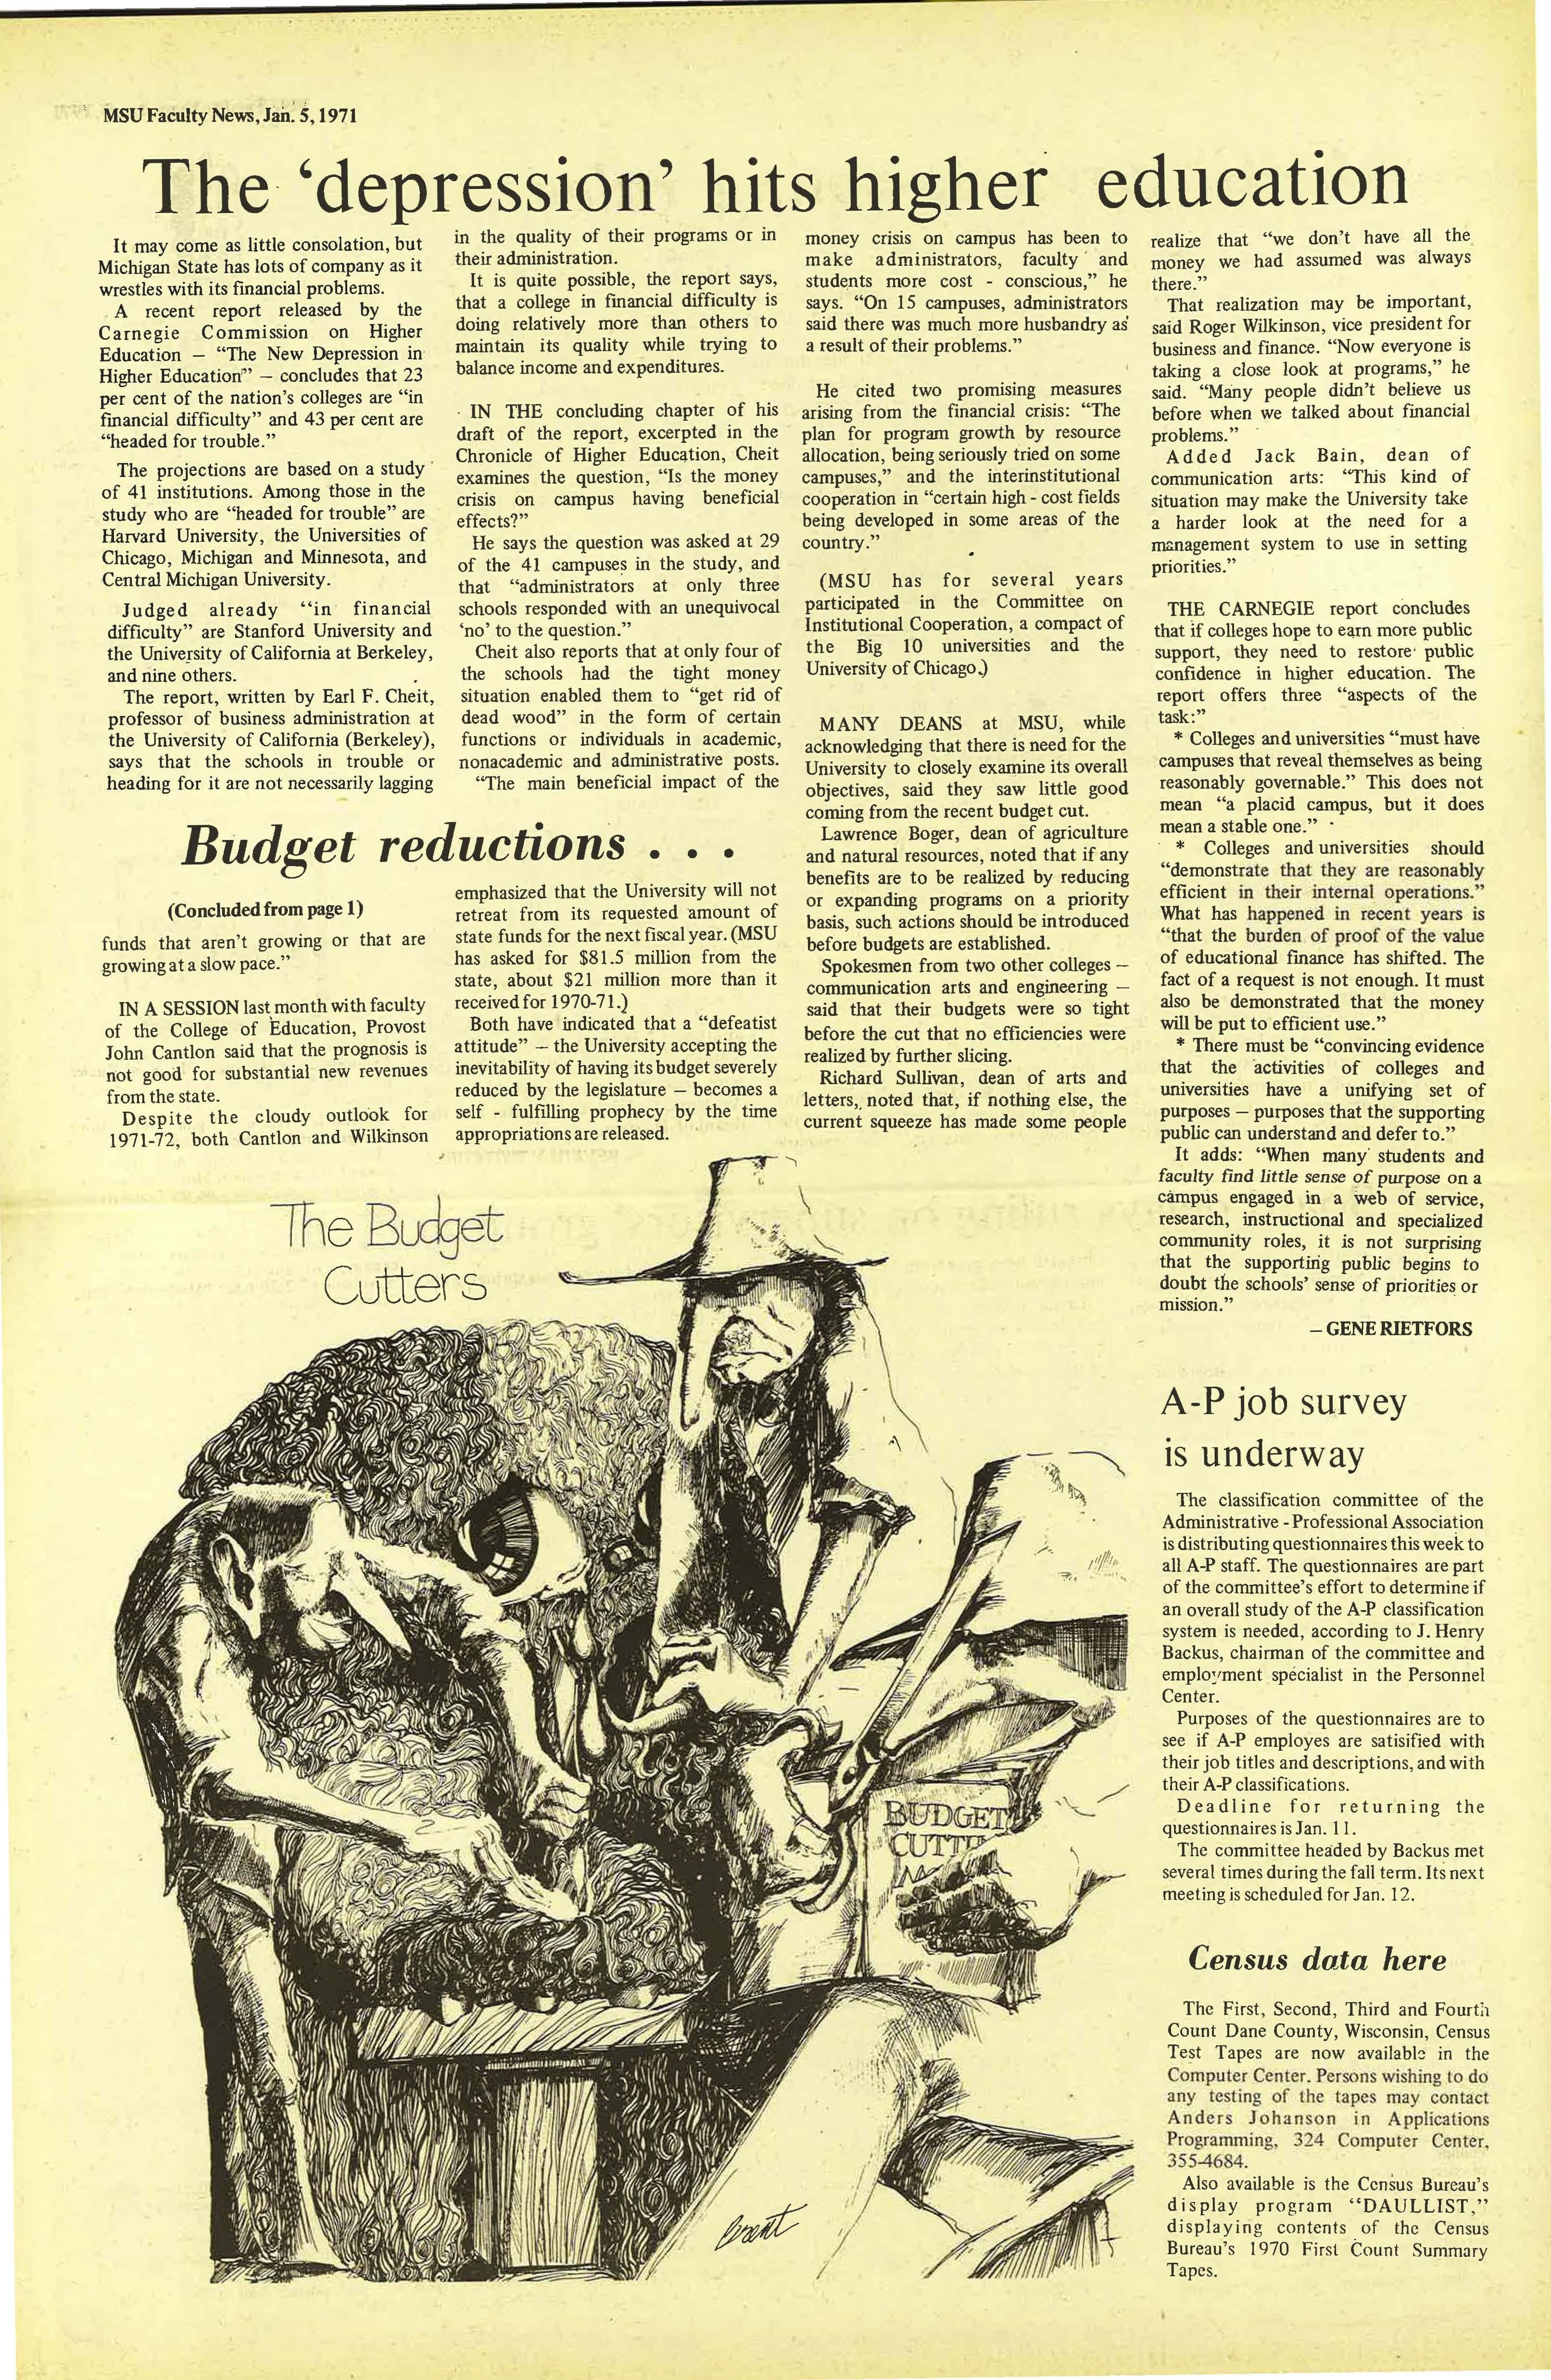 MSU News Bulletin, vol. 3, No. 4, October 14, 1971